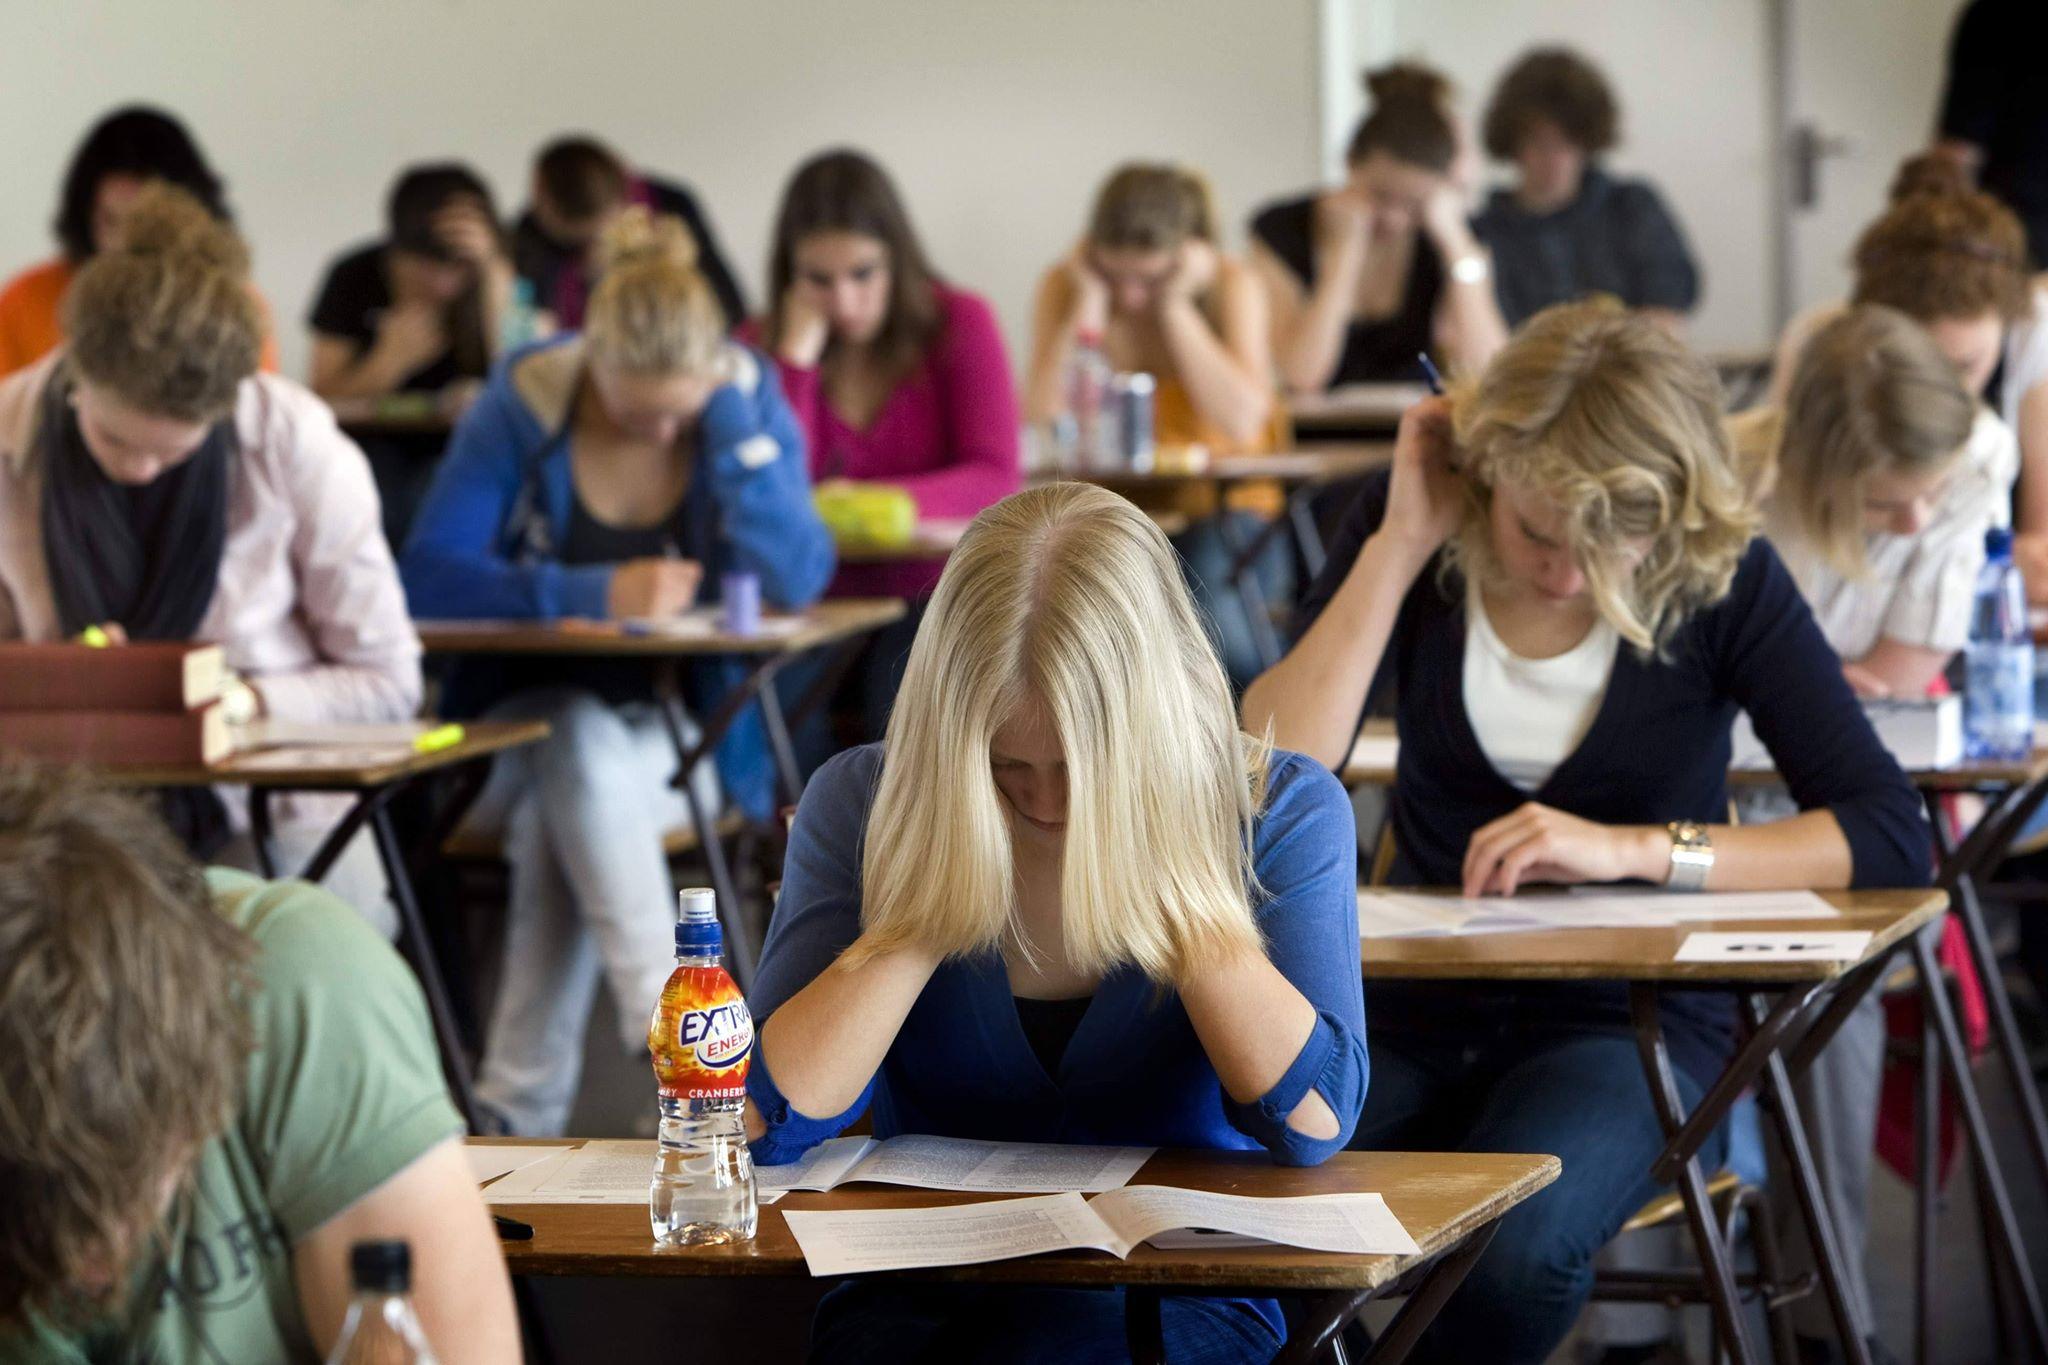 Elevii, nemulțumiți de modul de examinare